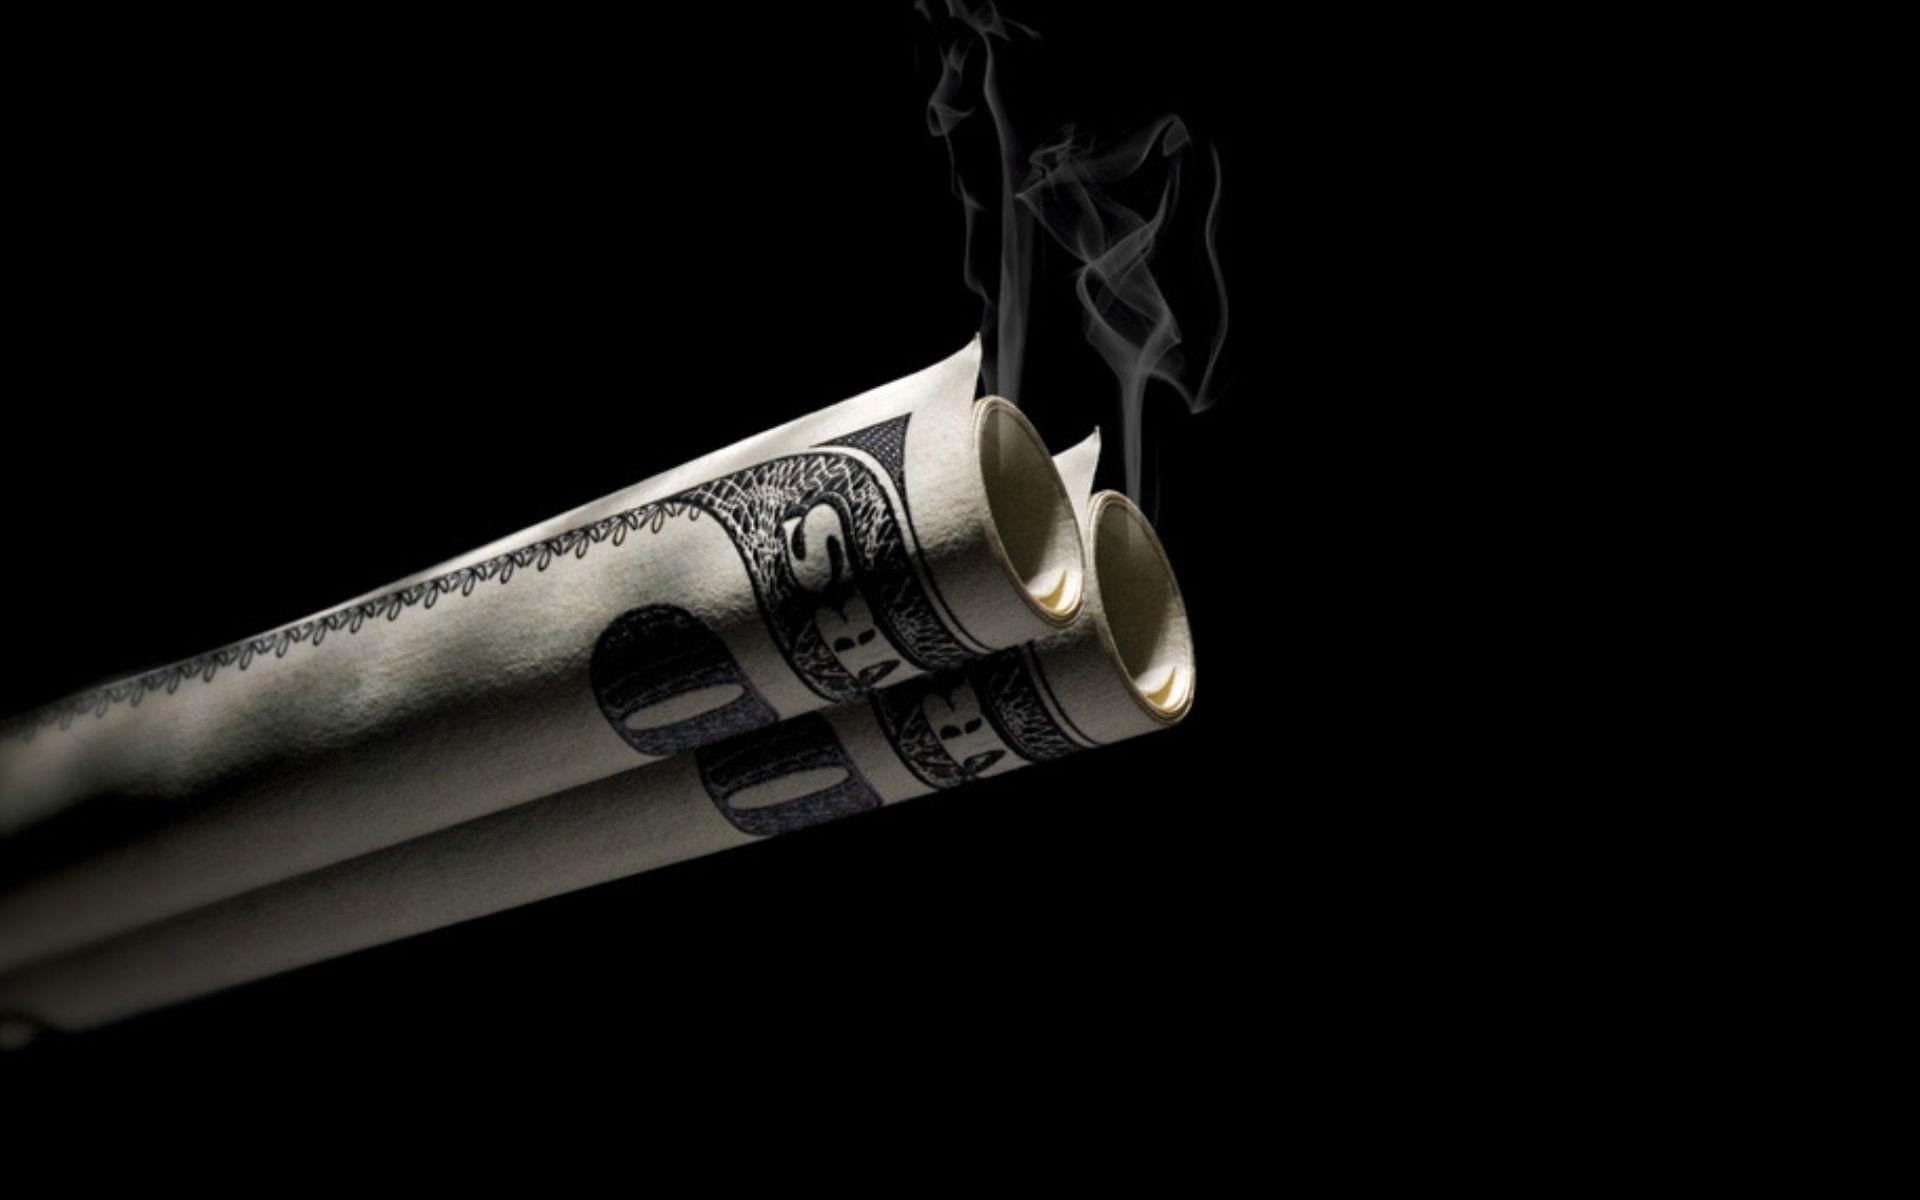 Smoking Money Wallpaper 1920x1200 Smoking Money Cigarettes 1920x1200